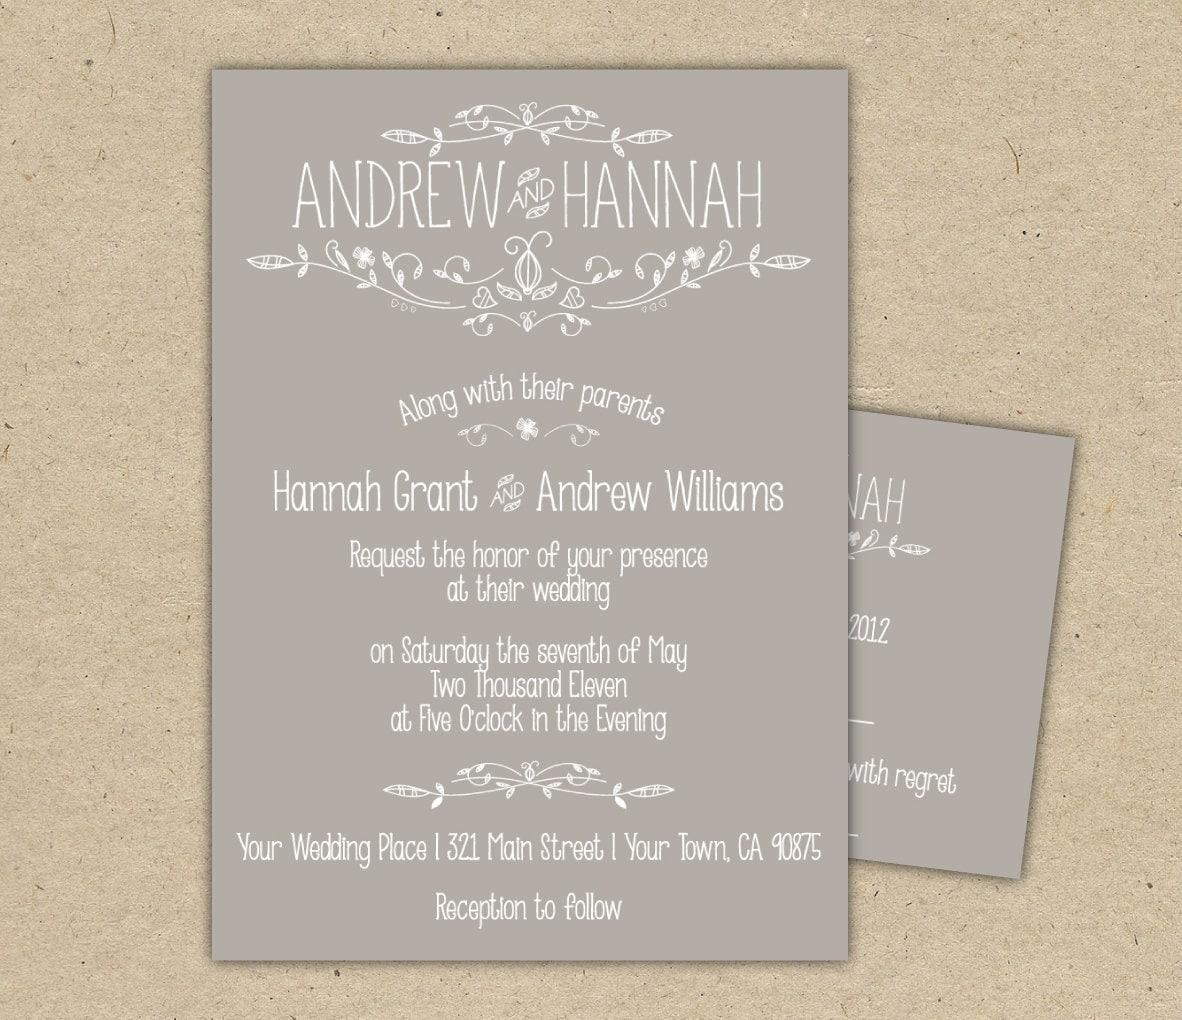 Wedding Invitation Wording: Wedding Invitation Wording ...